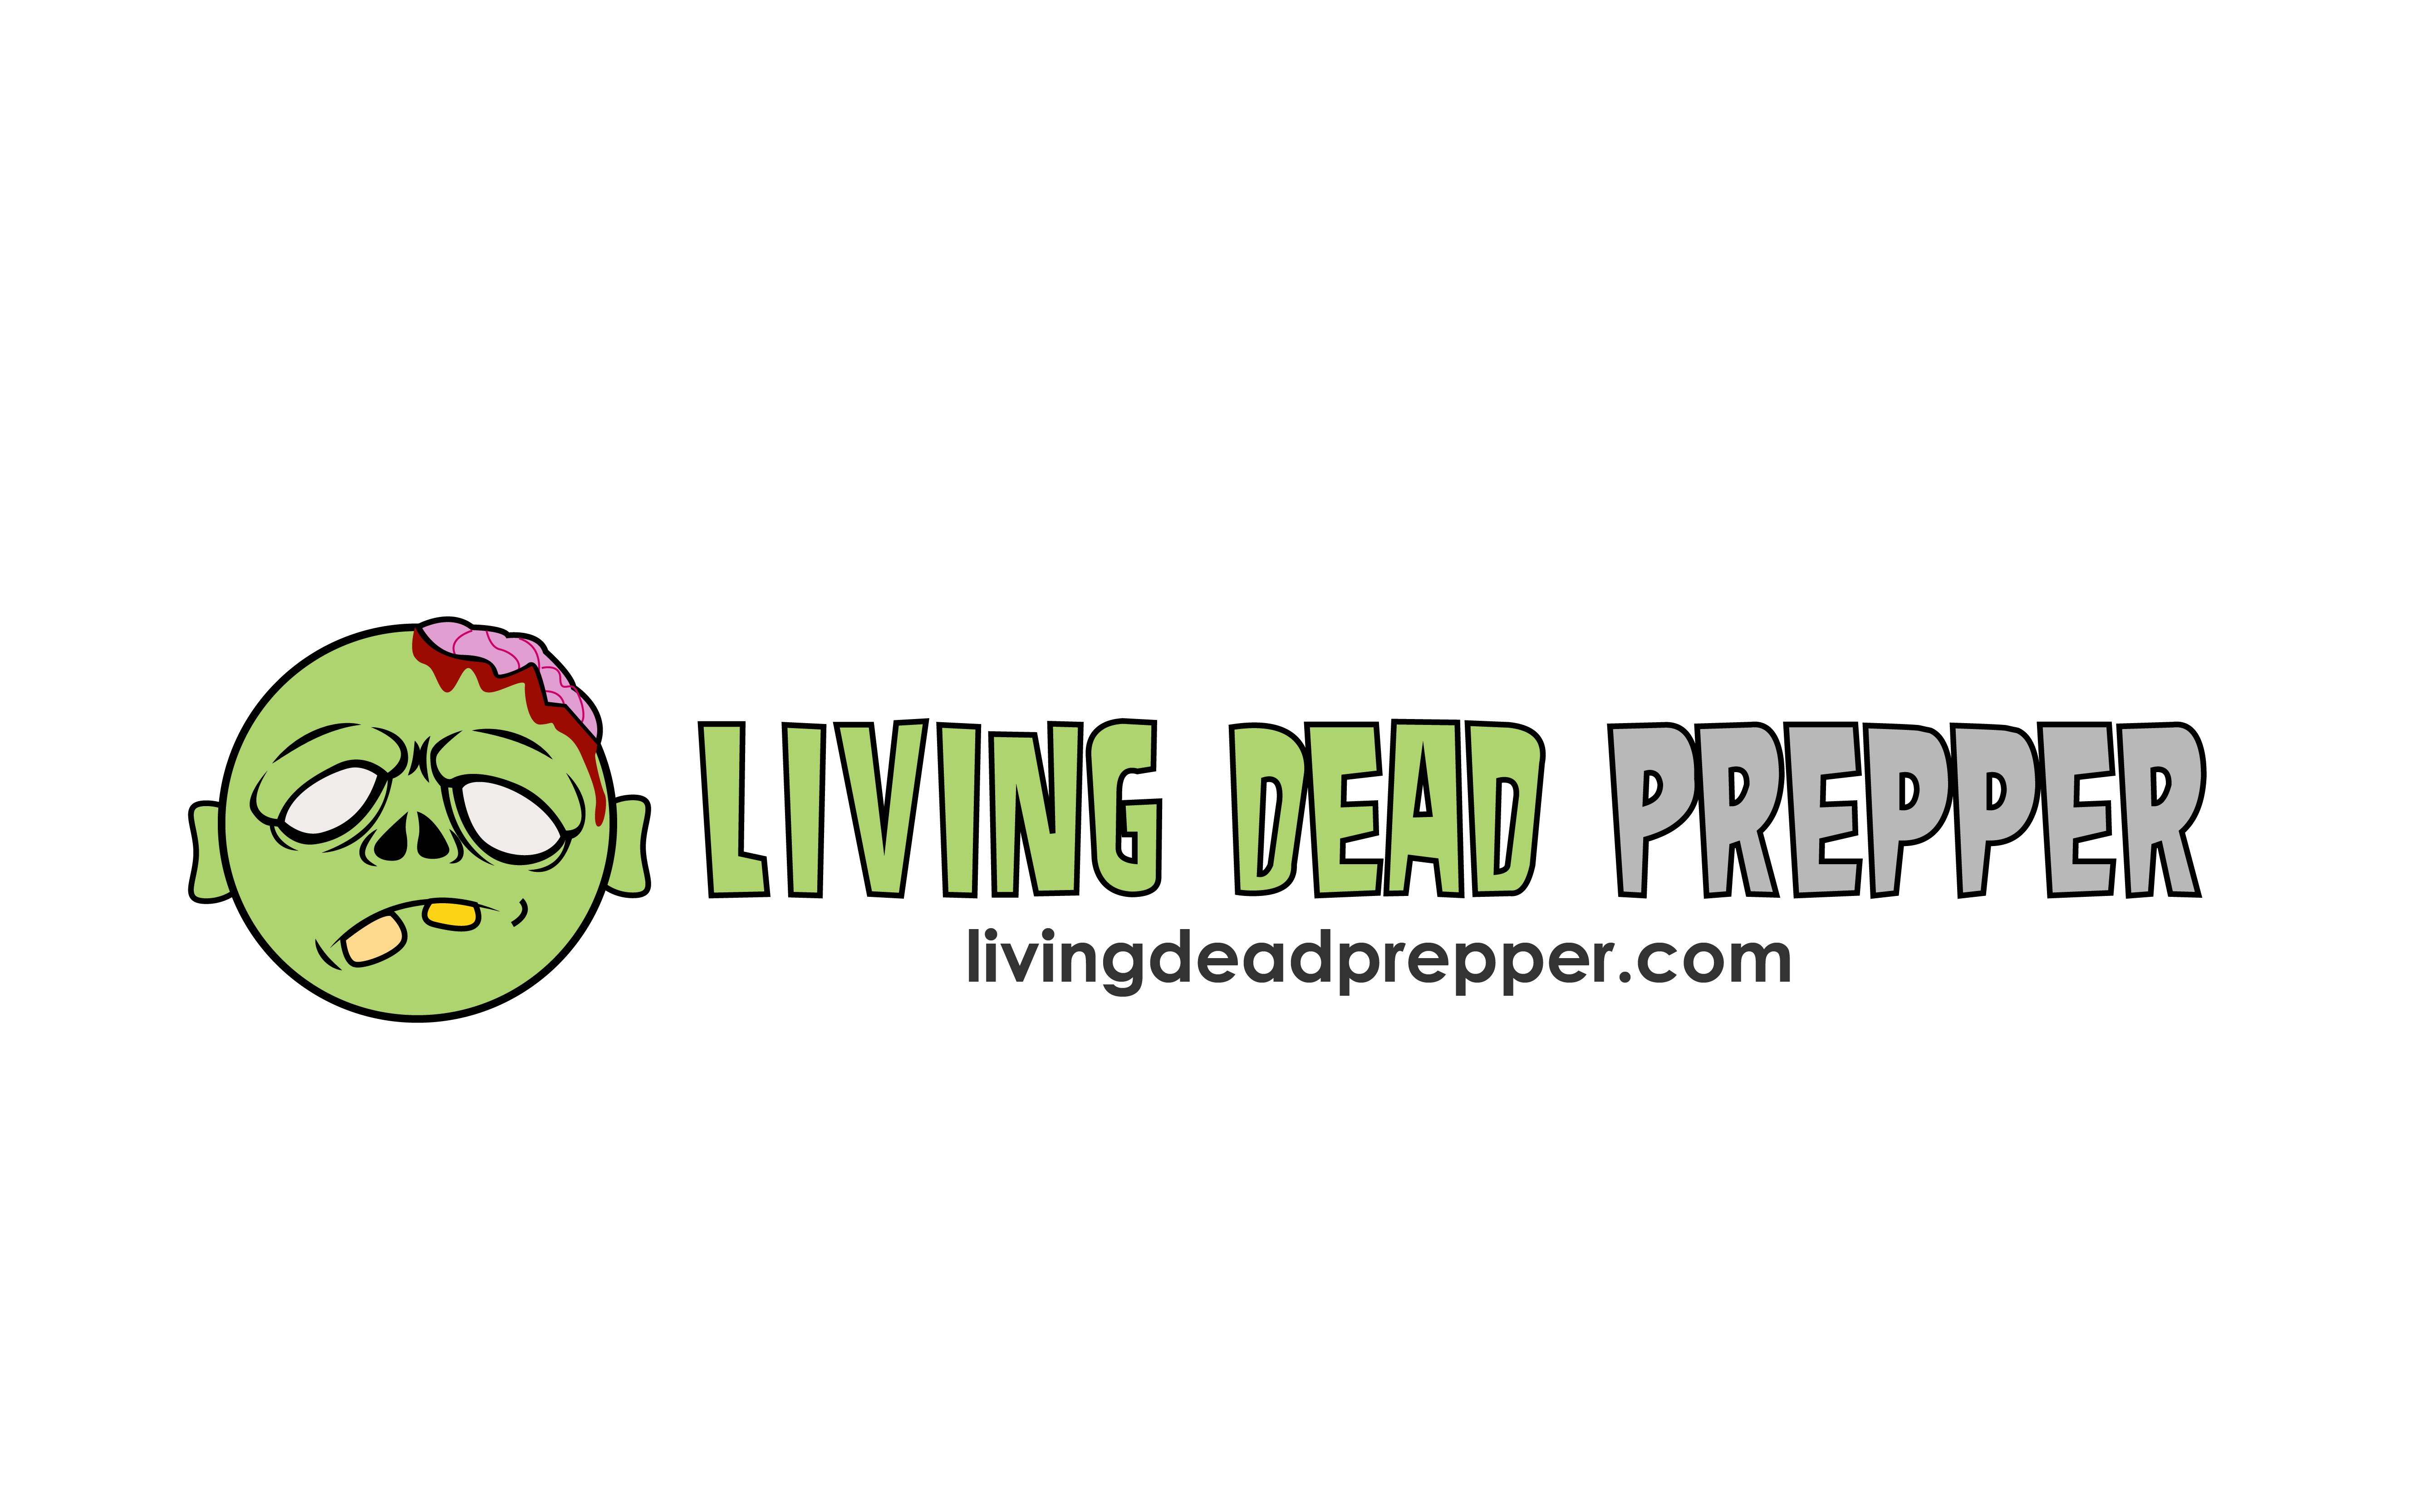 Living Dead Prepper